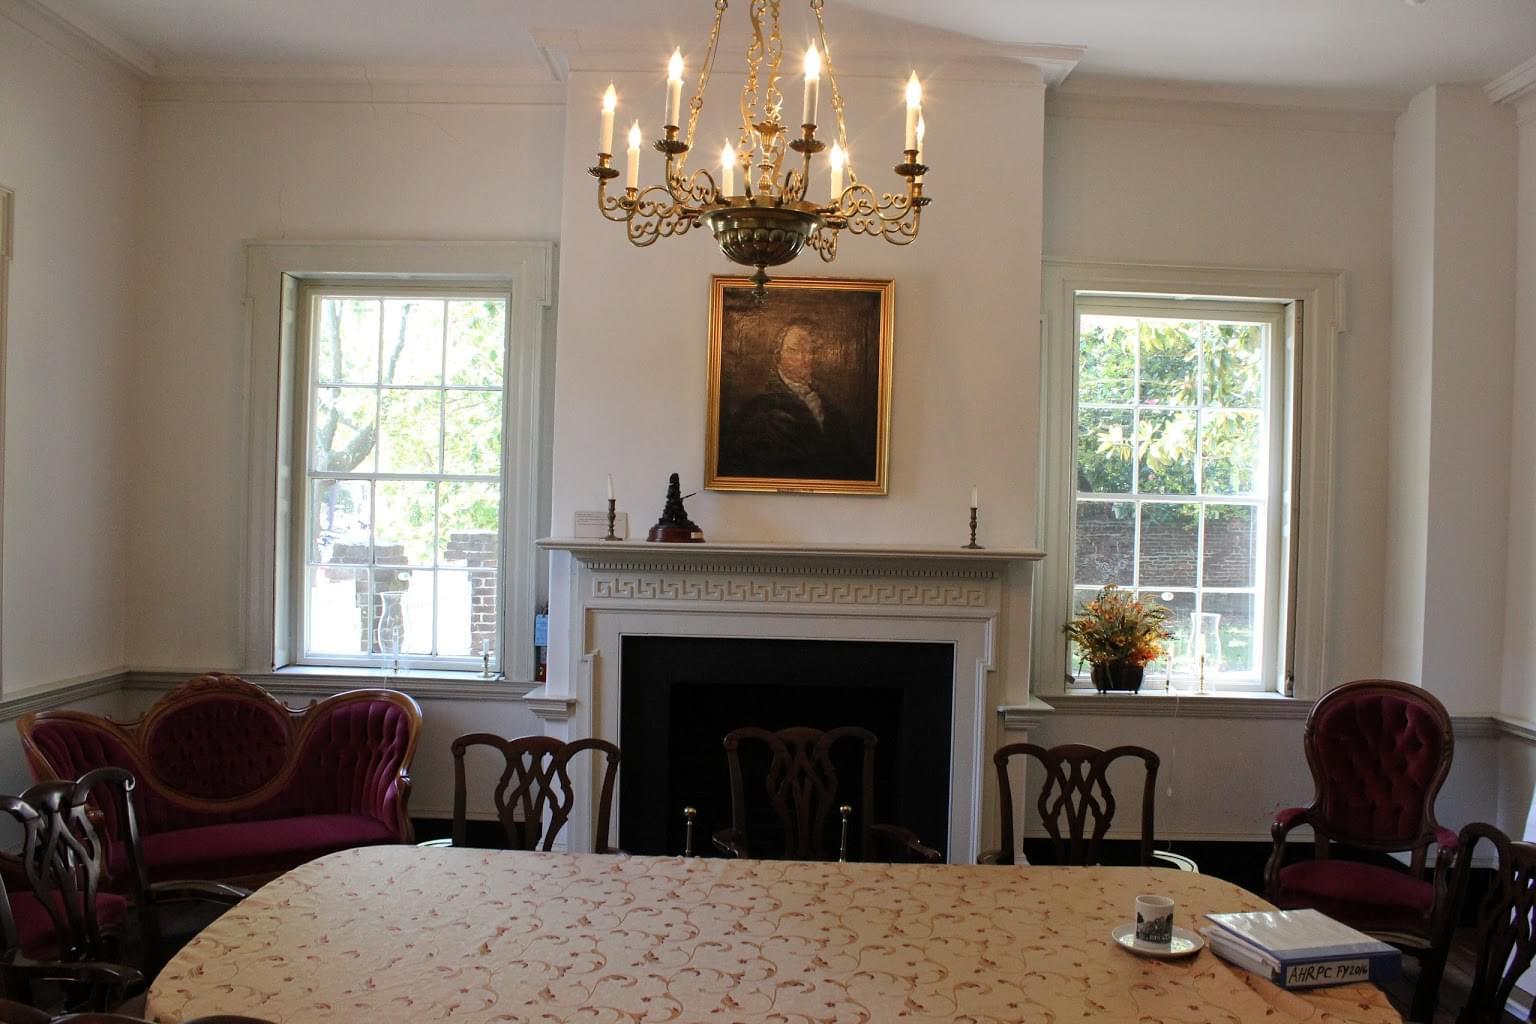 Lloyd House Alexandria, VA Historic building dining room